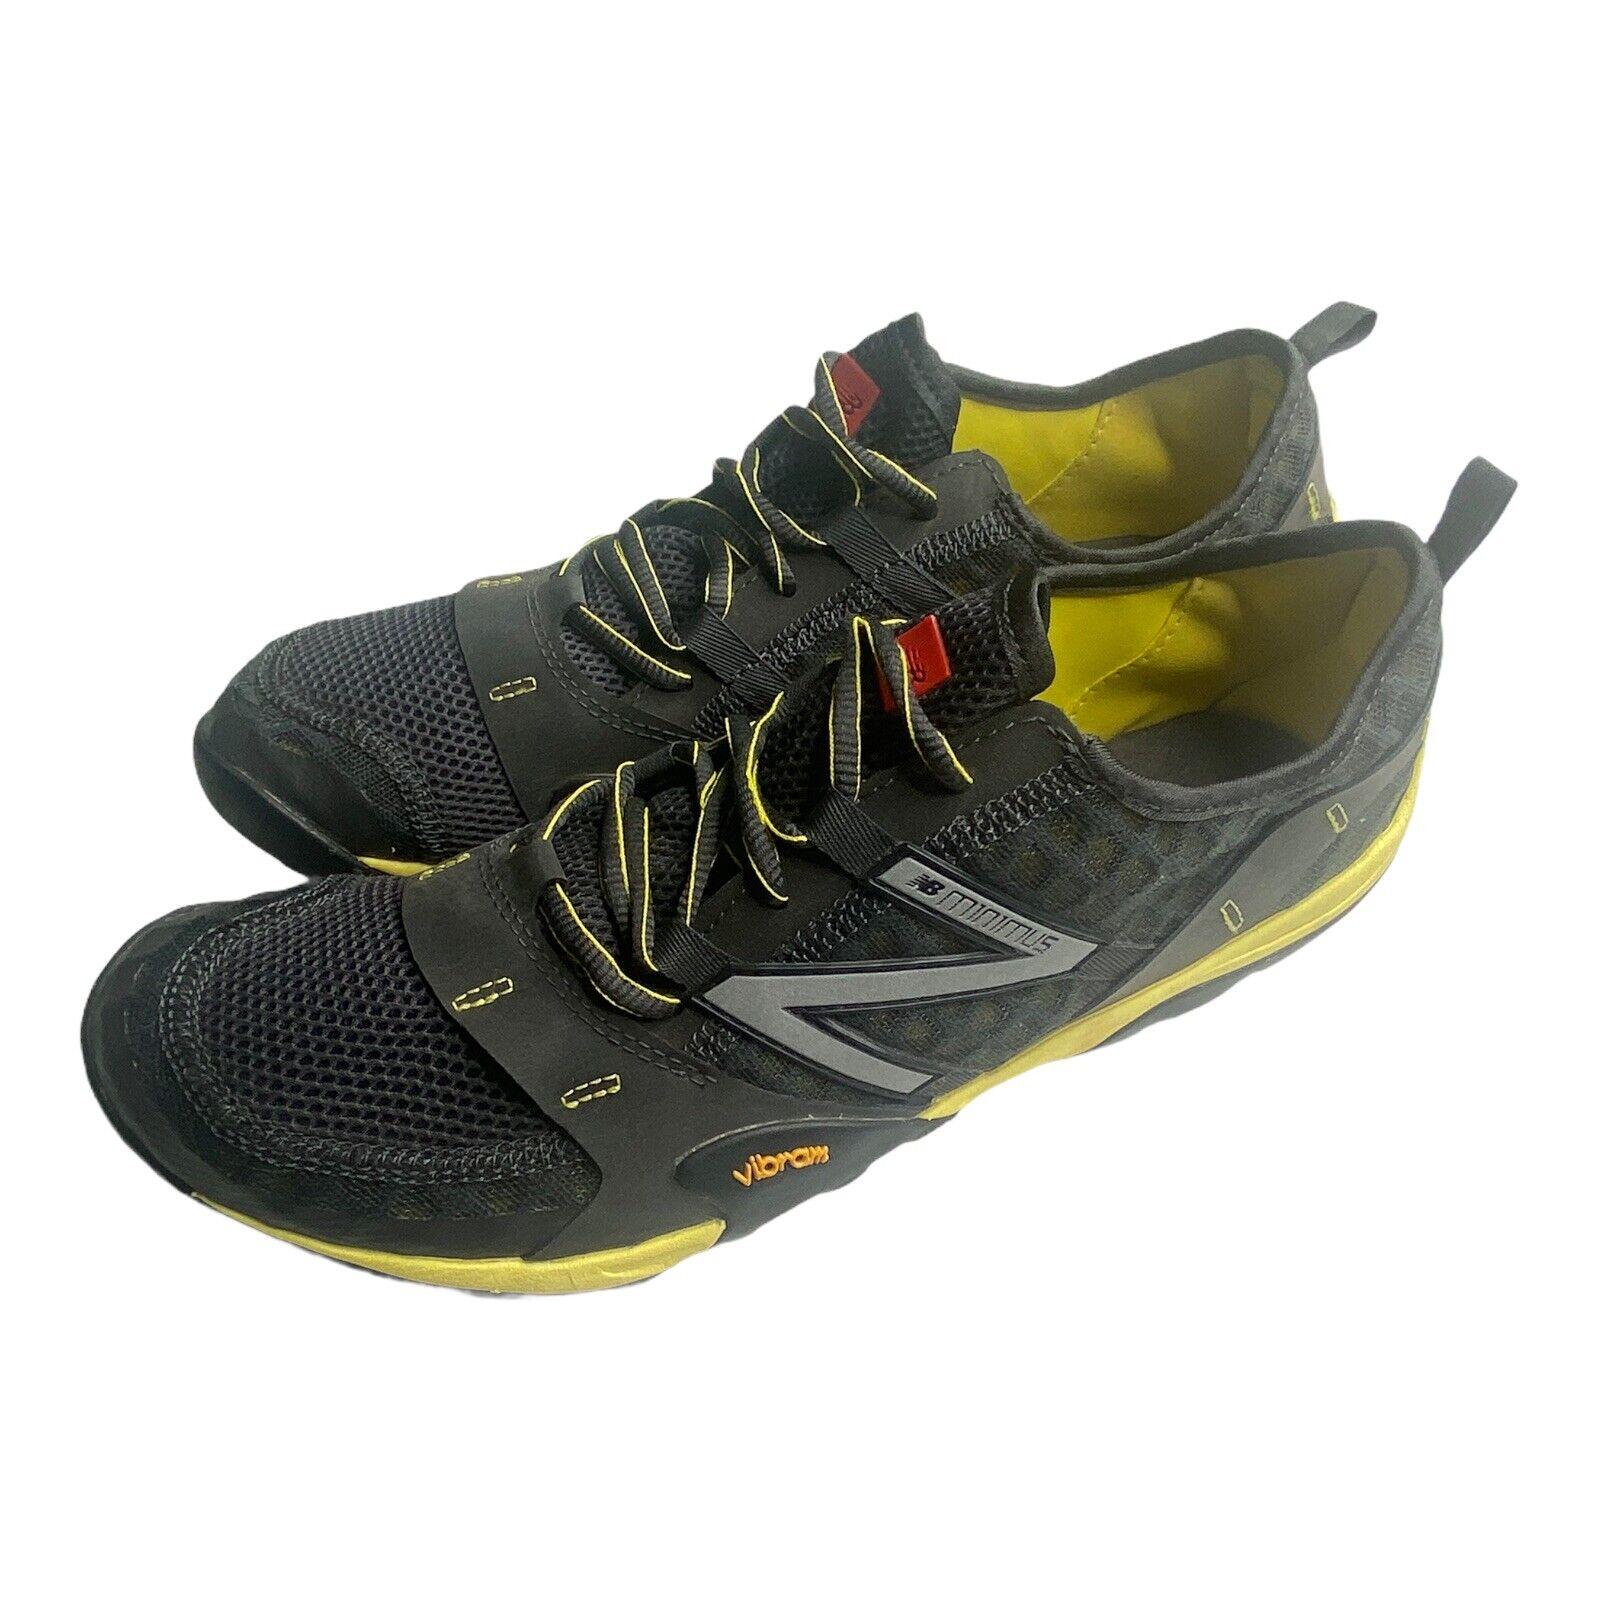 New Balance MT10GG Men's Athletic Shoe Sz 11 Black Yellow